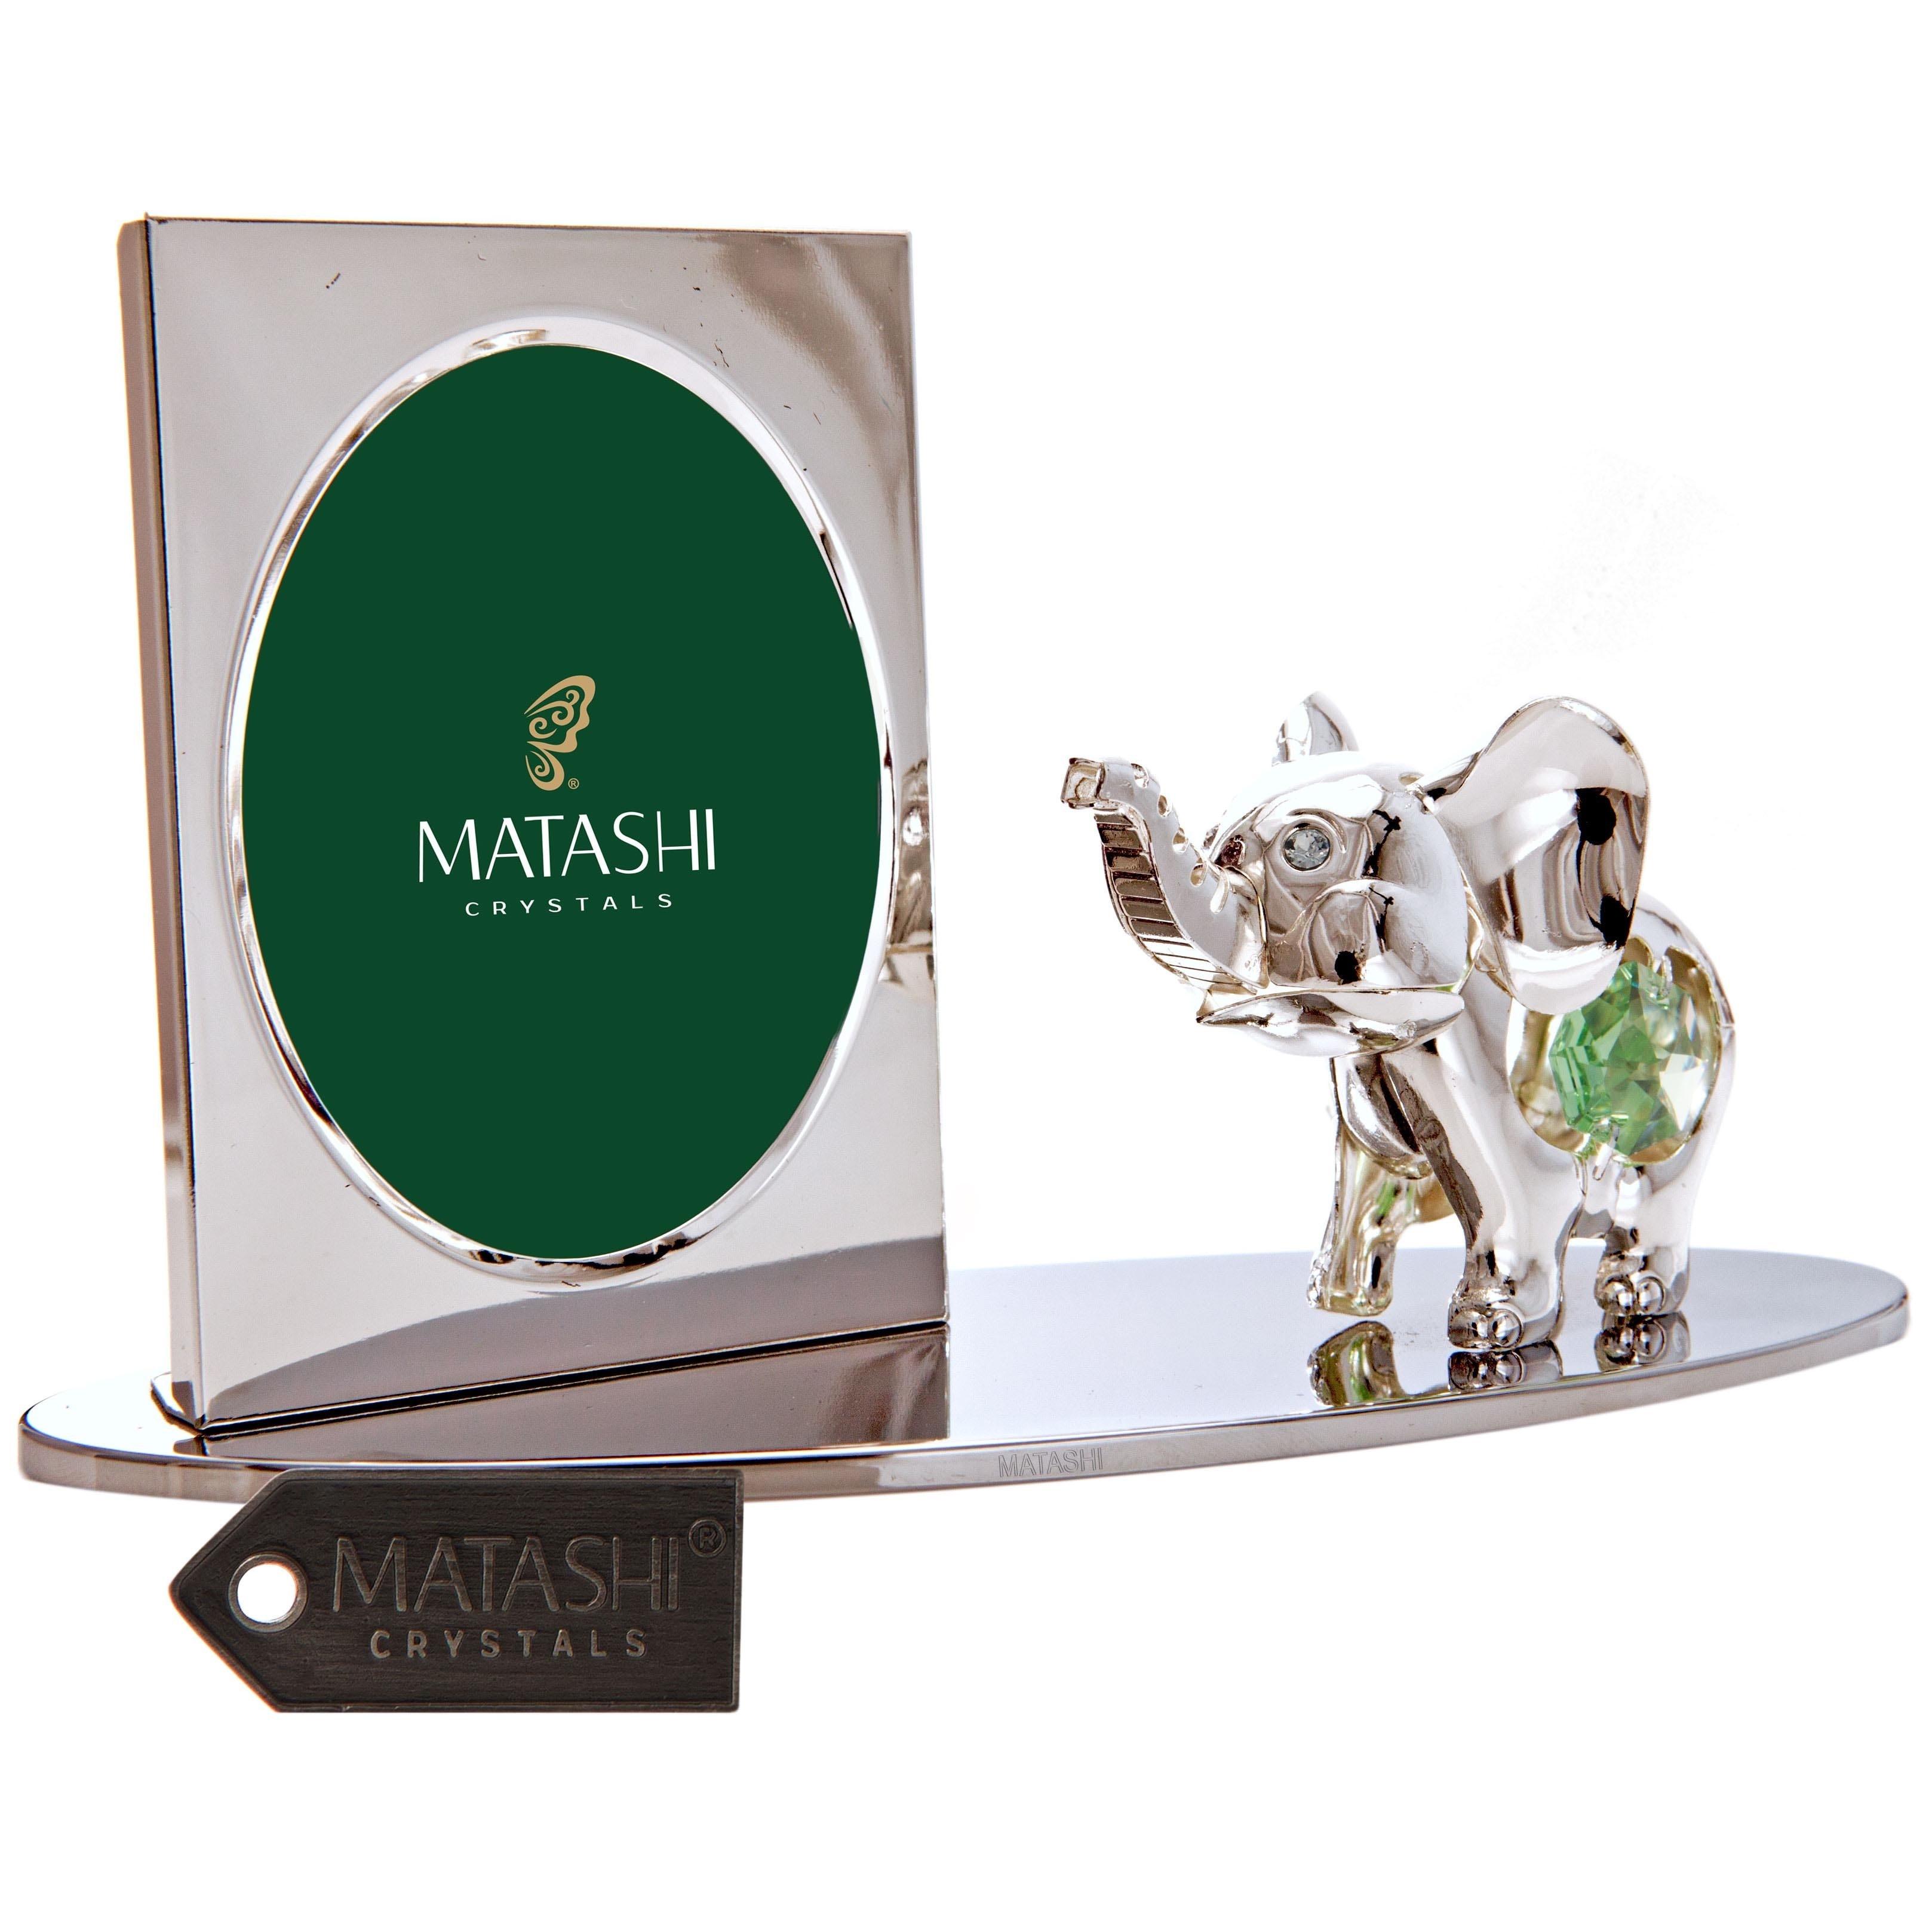 Matashi Cartoon Elephant Picture Frame with Genuine Matas...